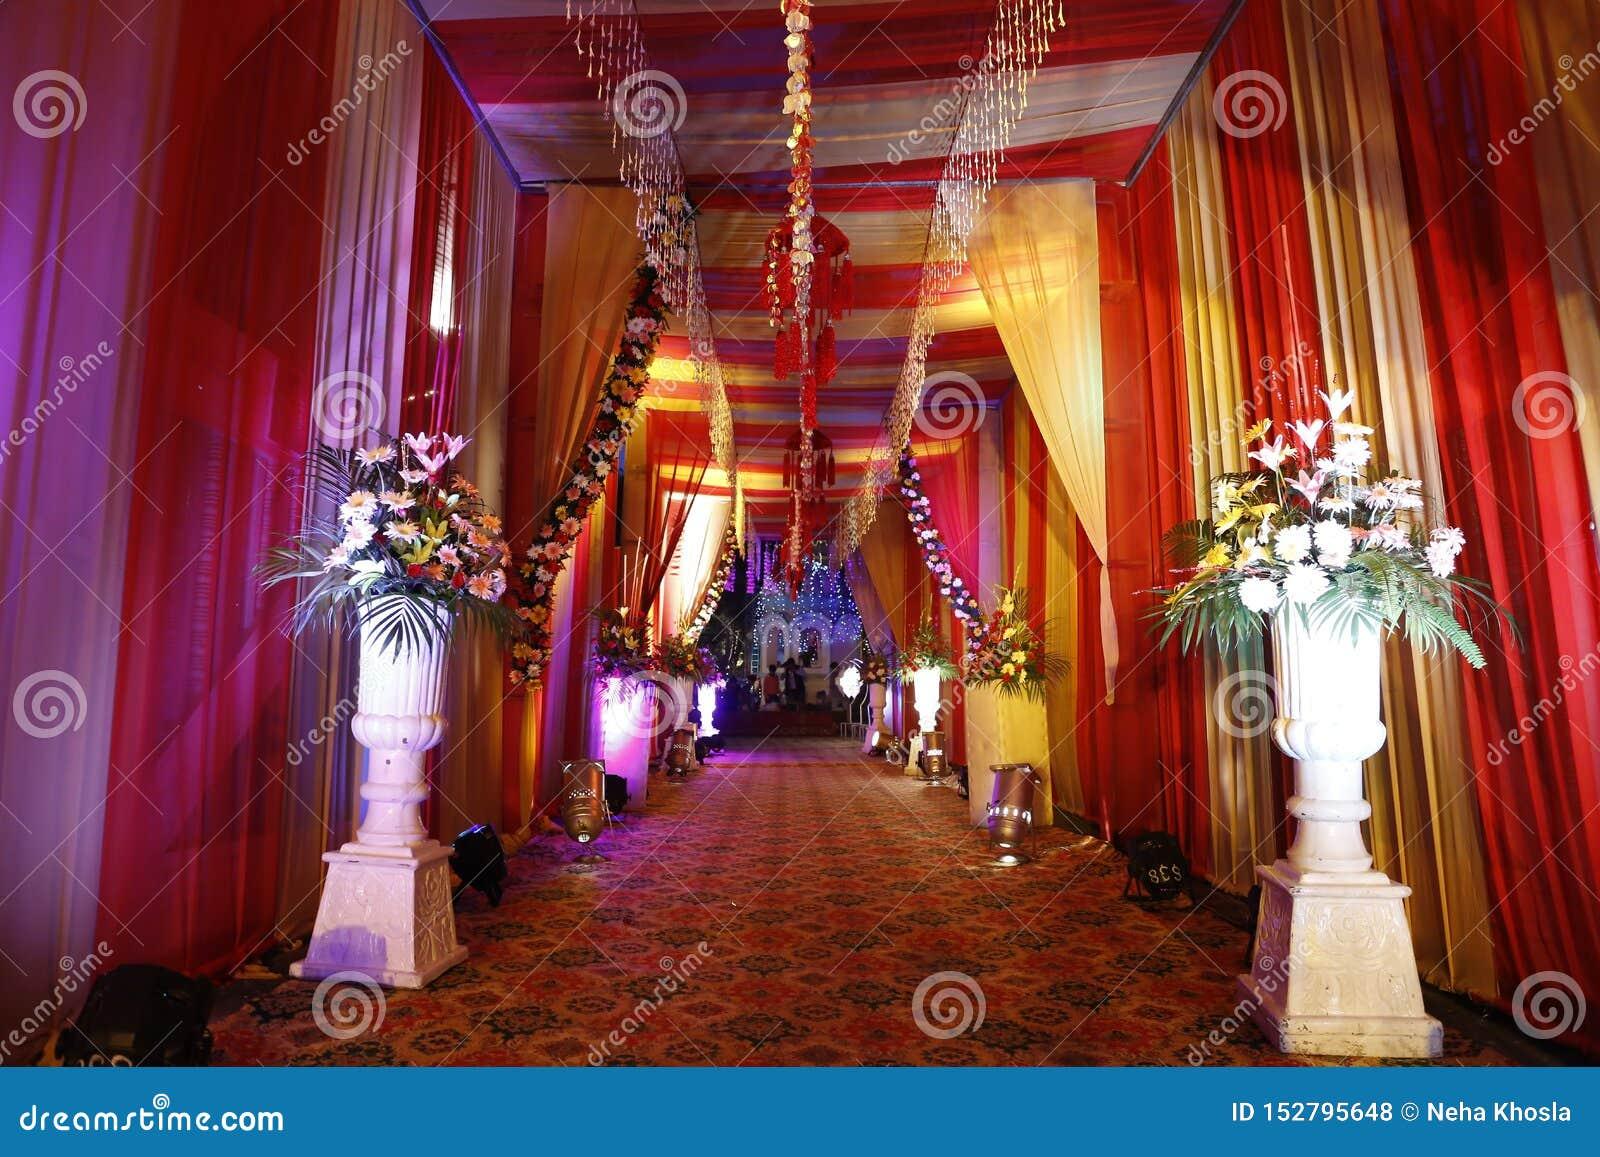 Bel héritage de Nalagarh épousant Enterence